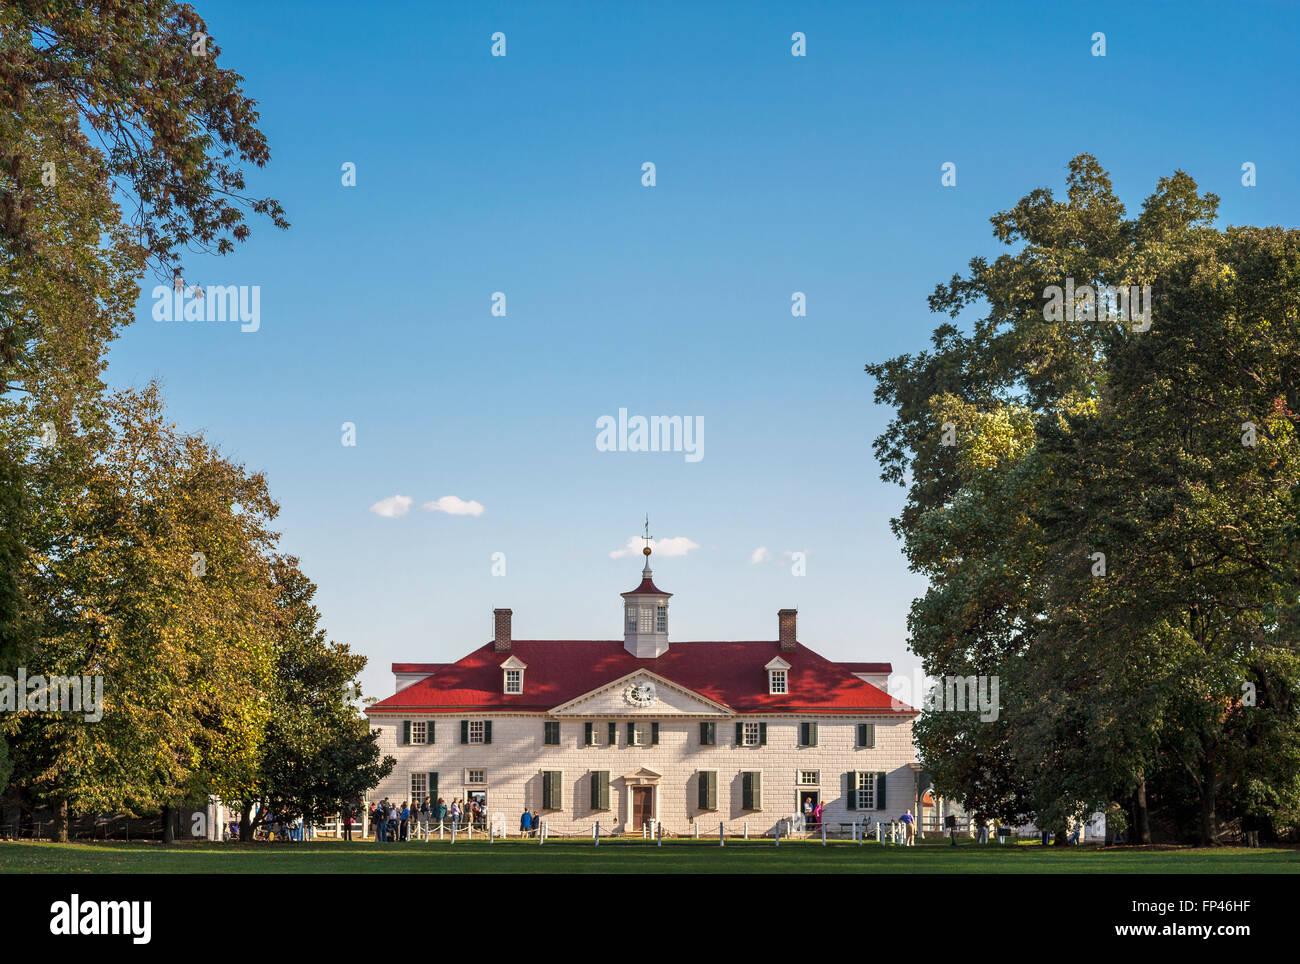 Mount Vernon the plantation home estate mansion of George and Martha Washington. Near Alexandria Virginia and Washington - Stock Image